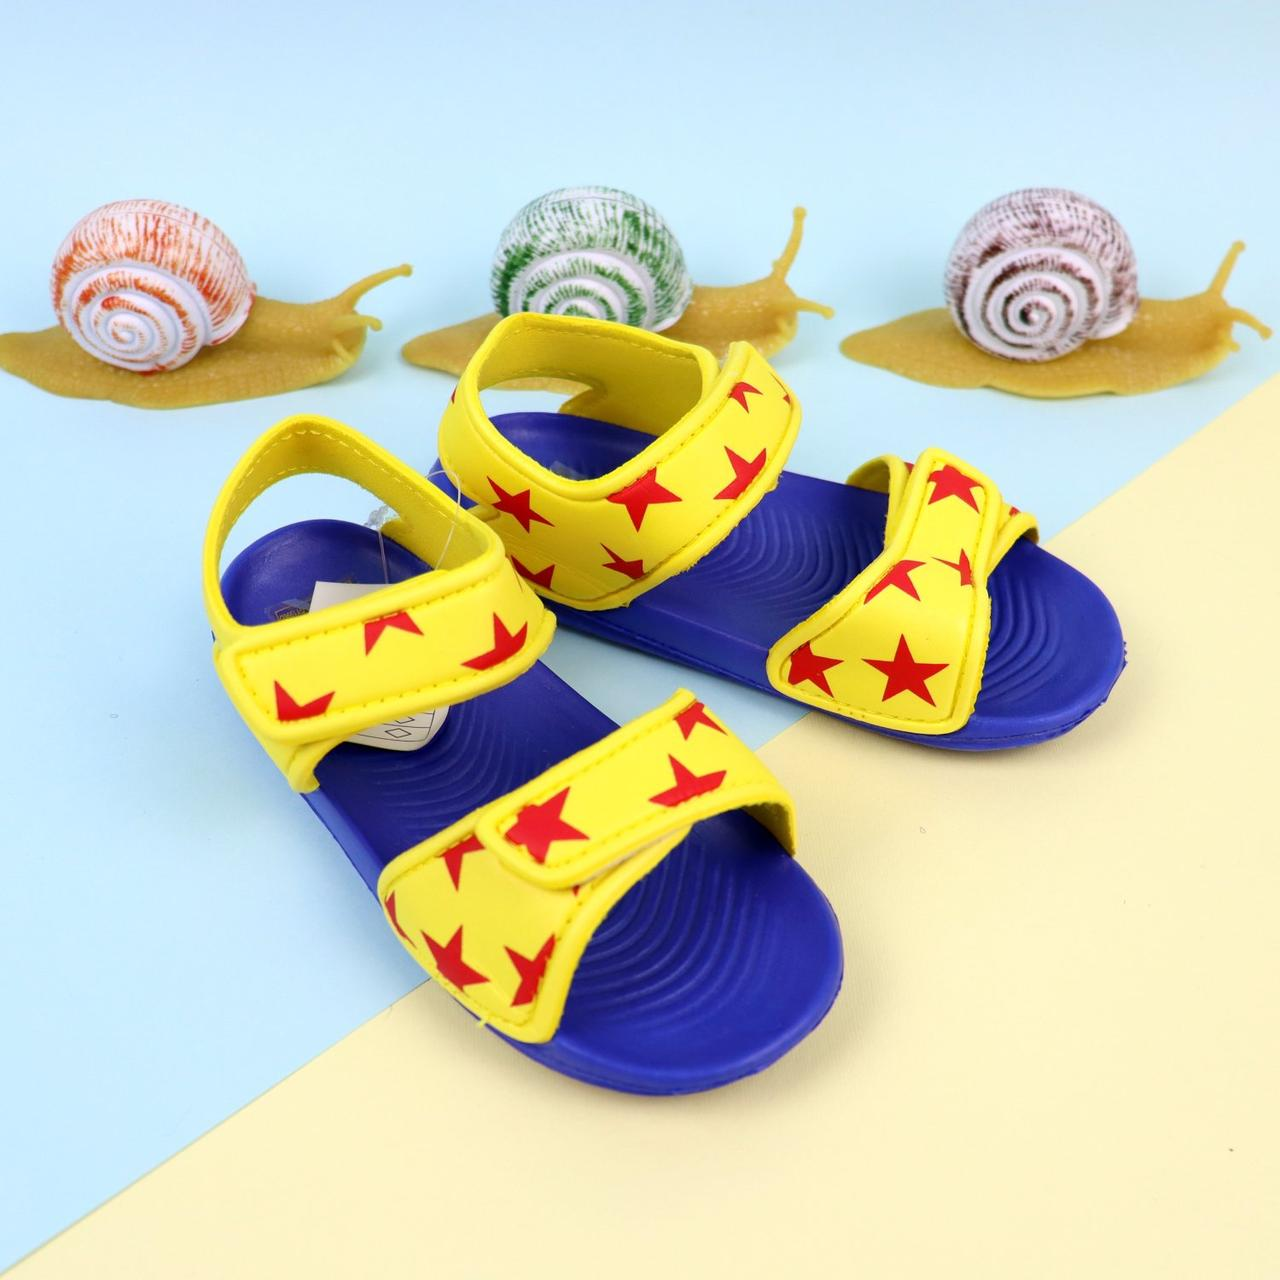 Сандалии пляжные для мальчика Звезды  желтые тм GIOLAN размер 29,30,31,32,34,35